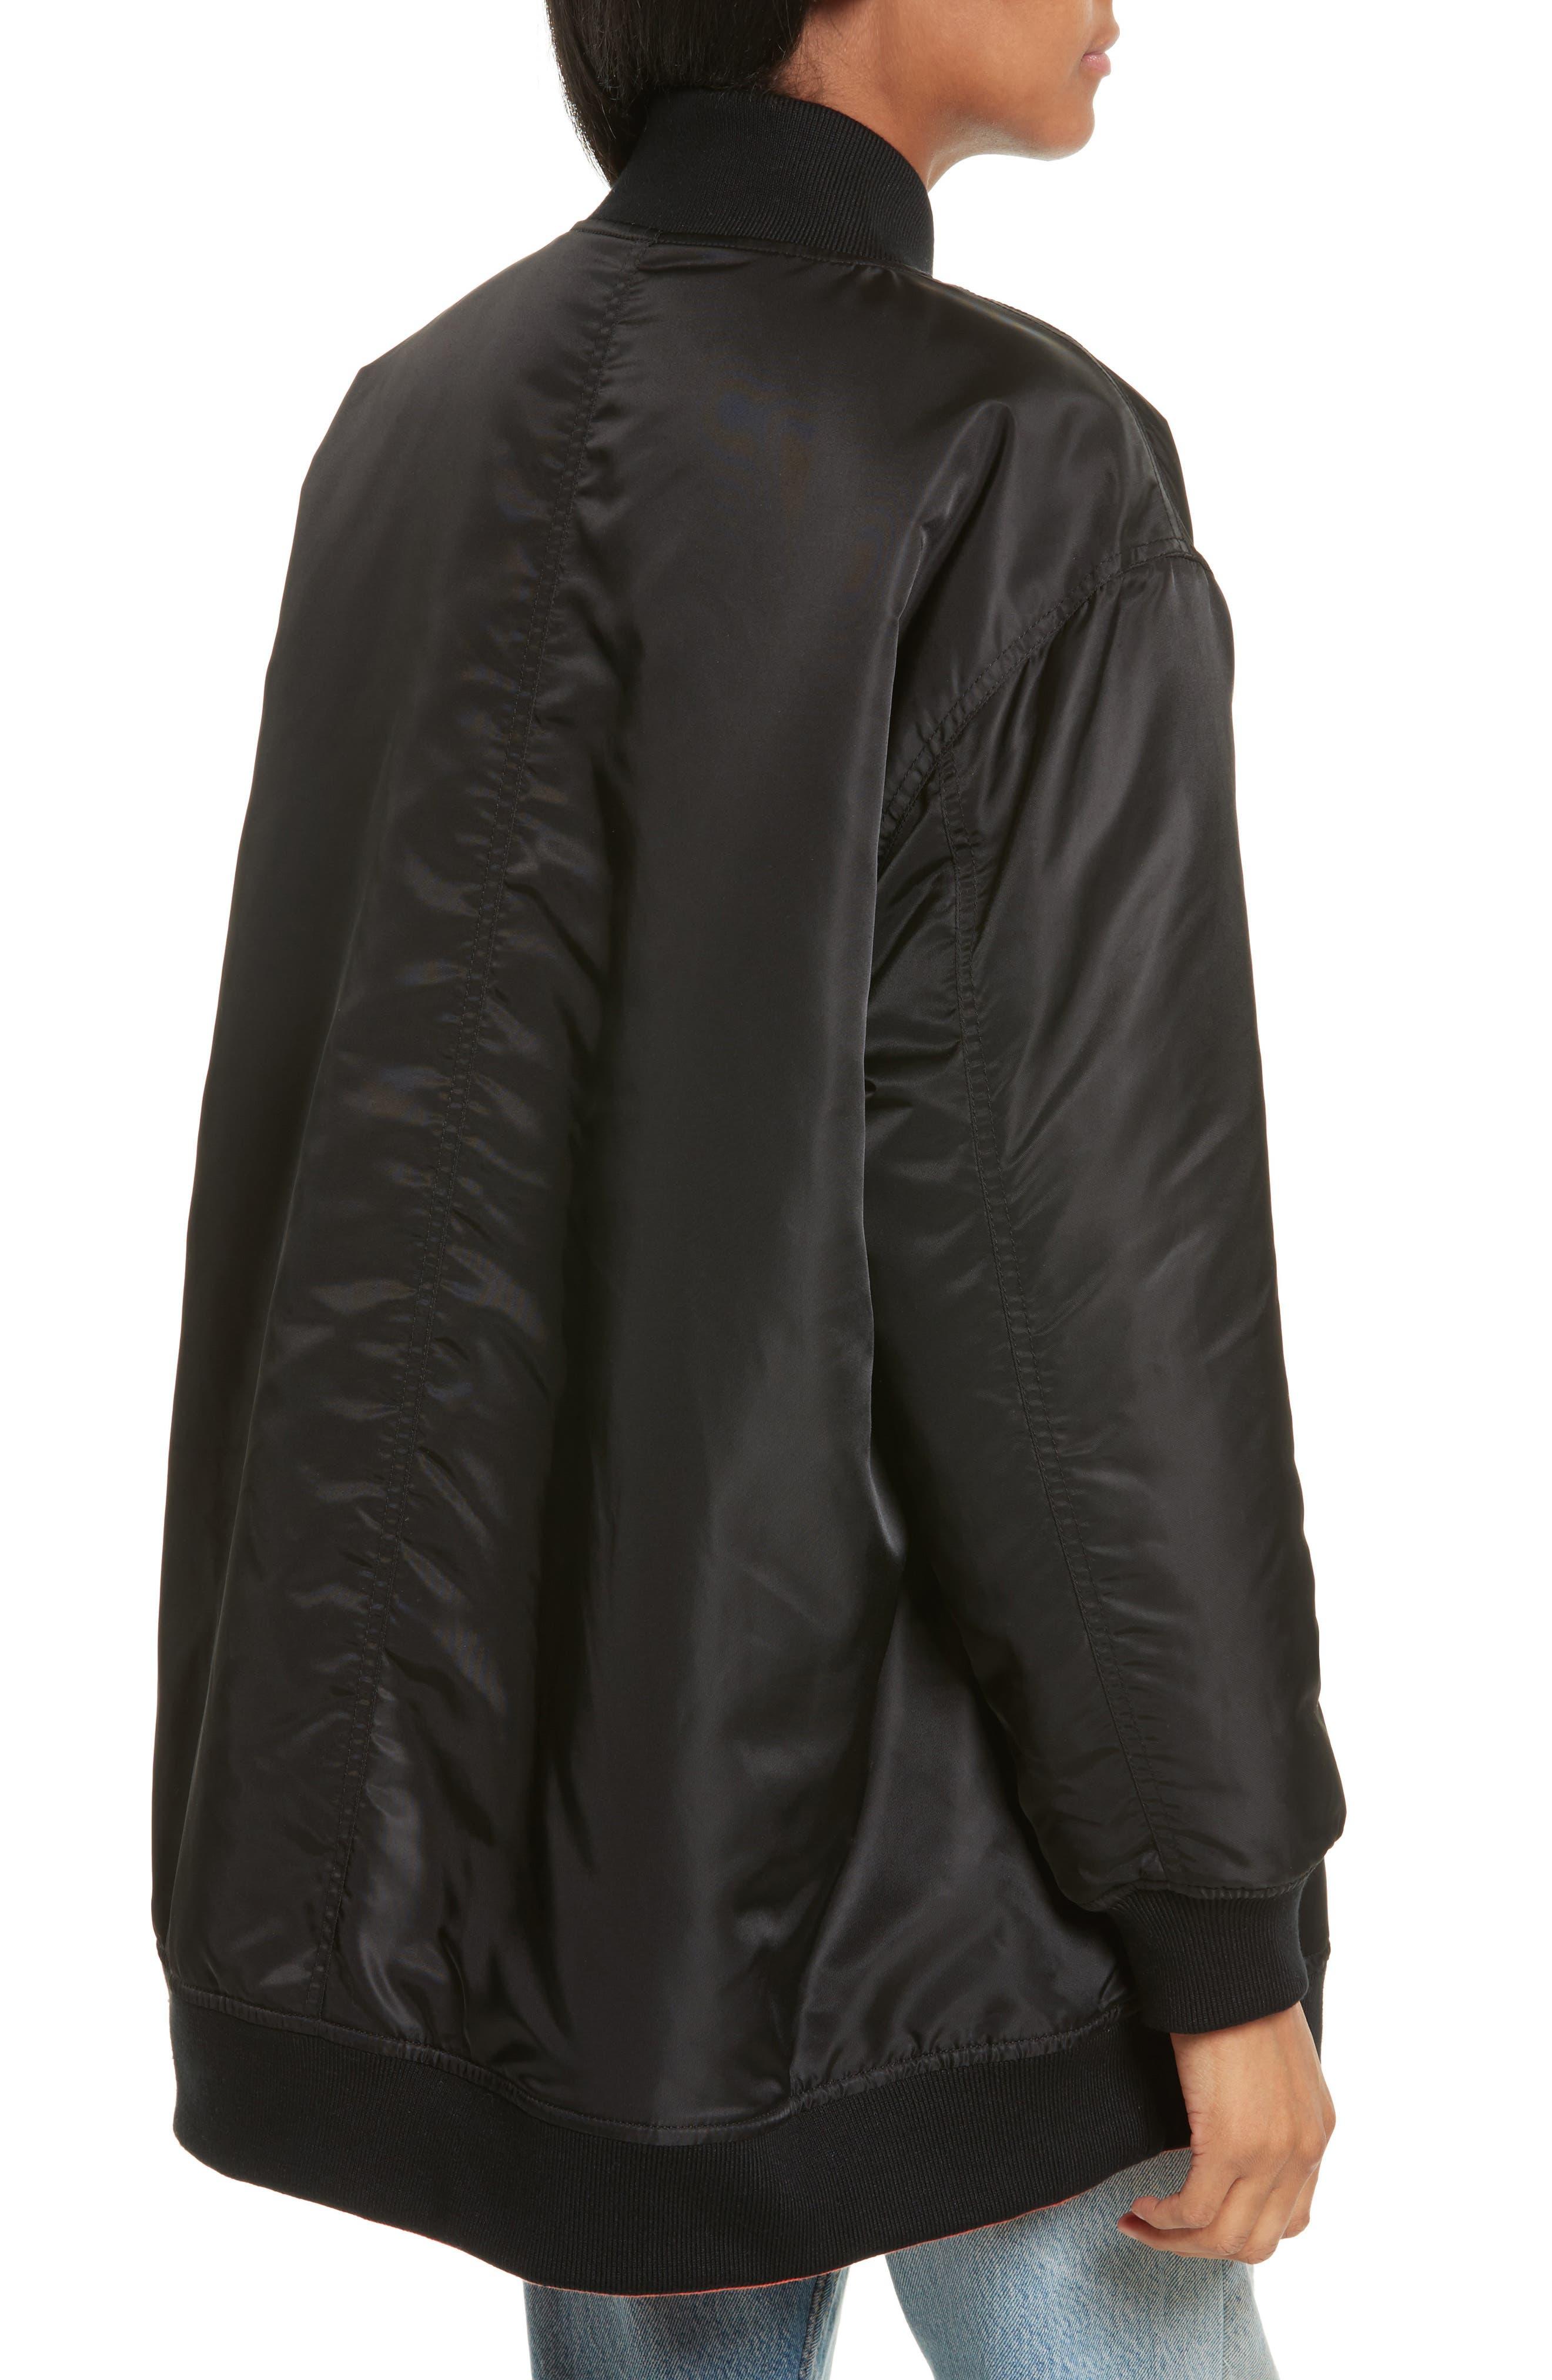 Reversible Bomber Jacket,                             Alternate thumbnail 2, color,                             Black